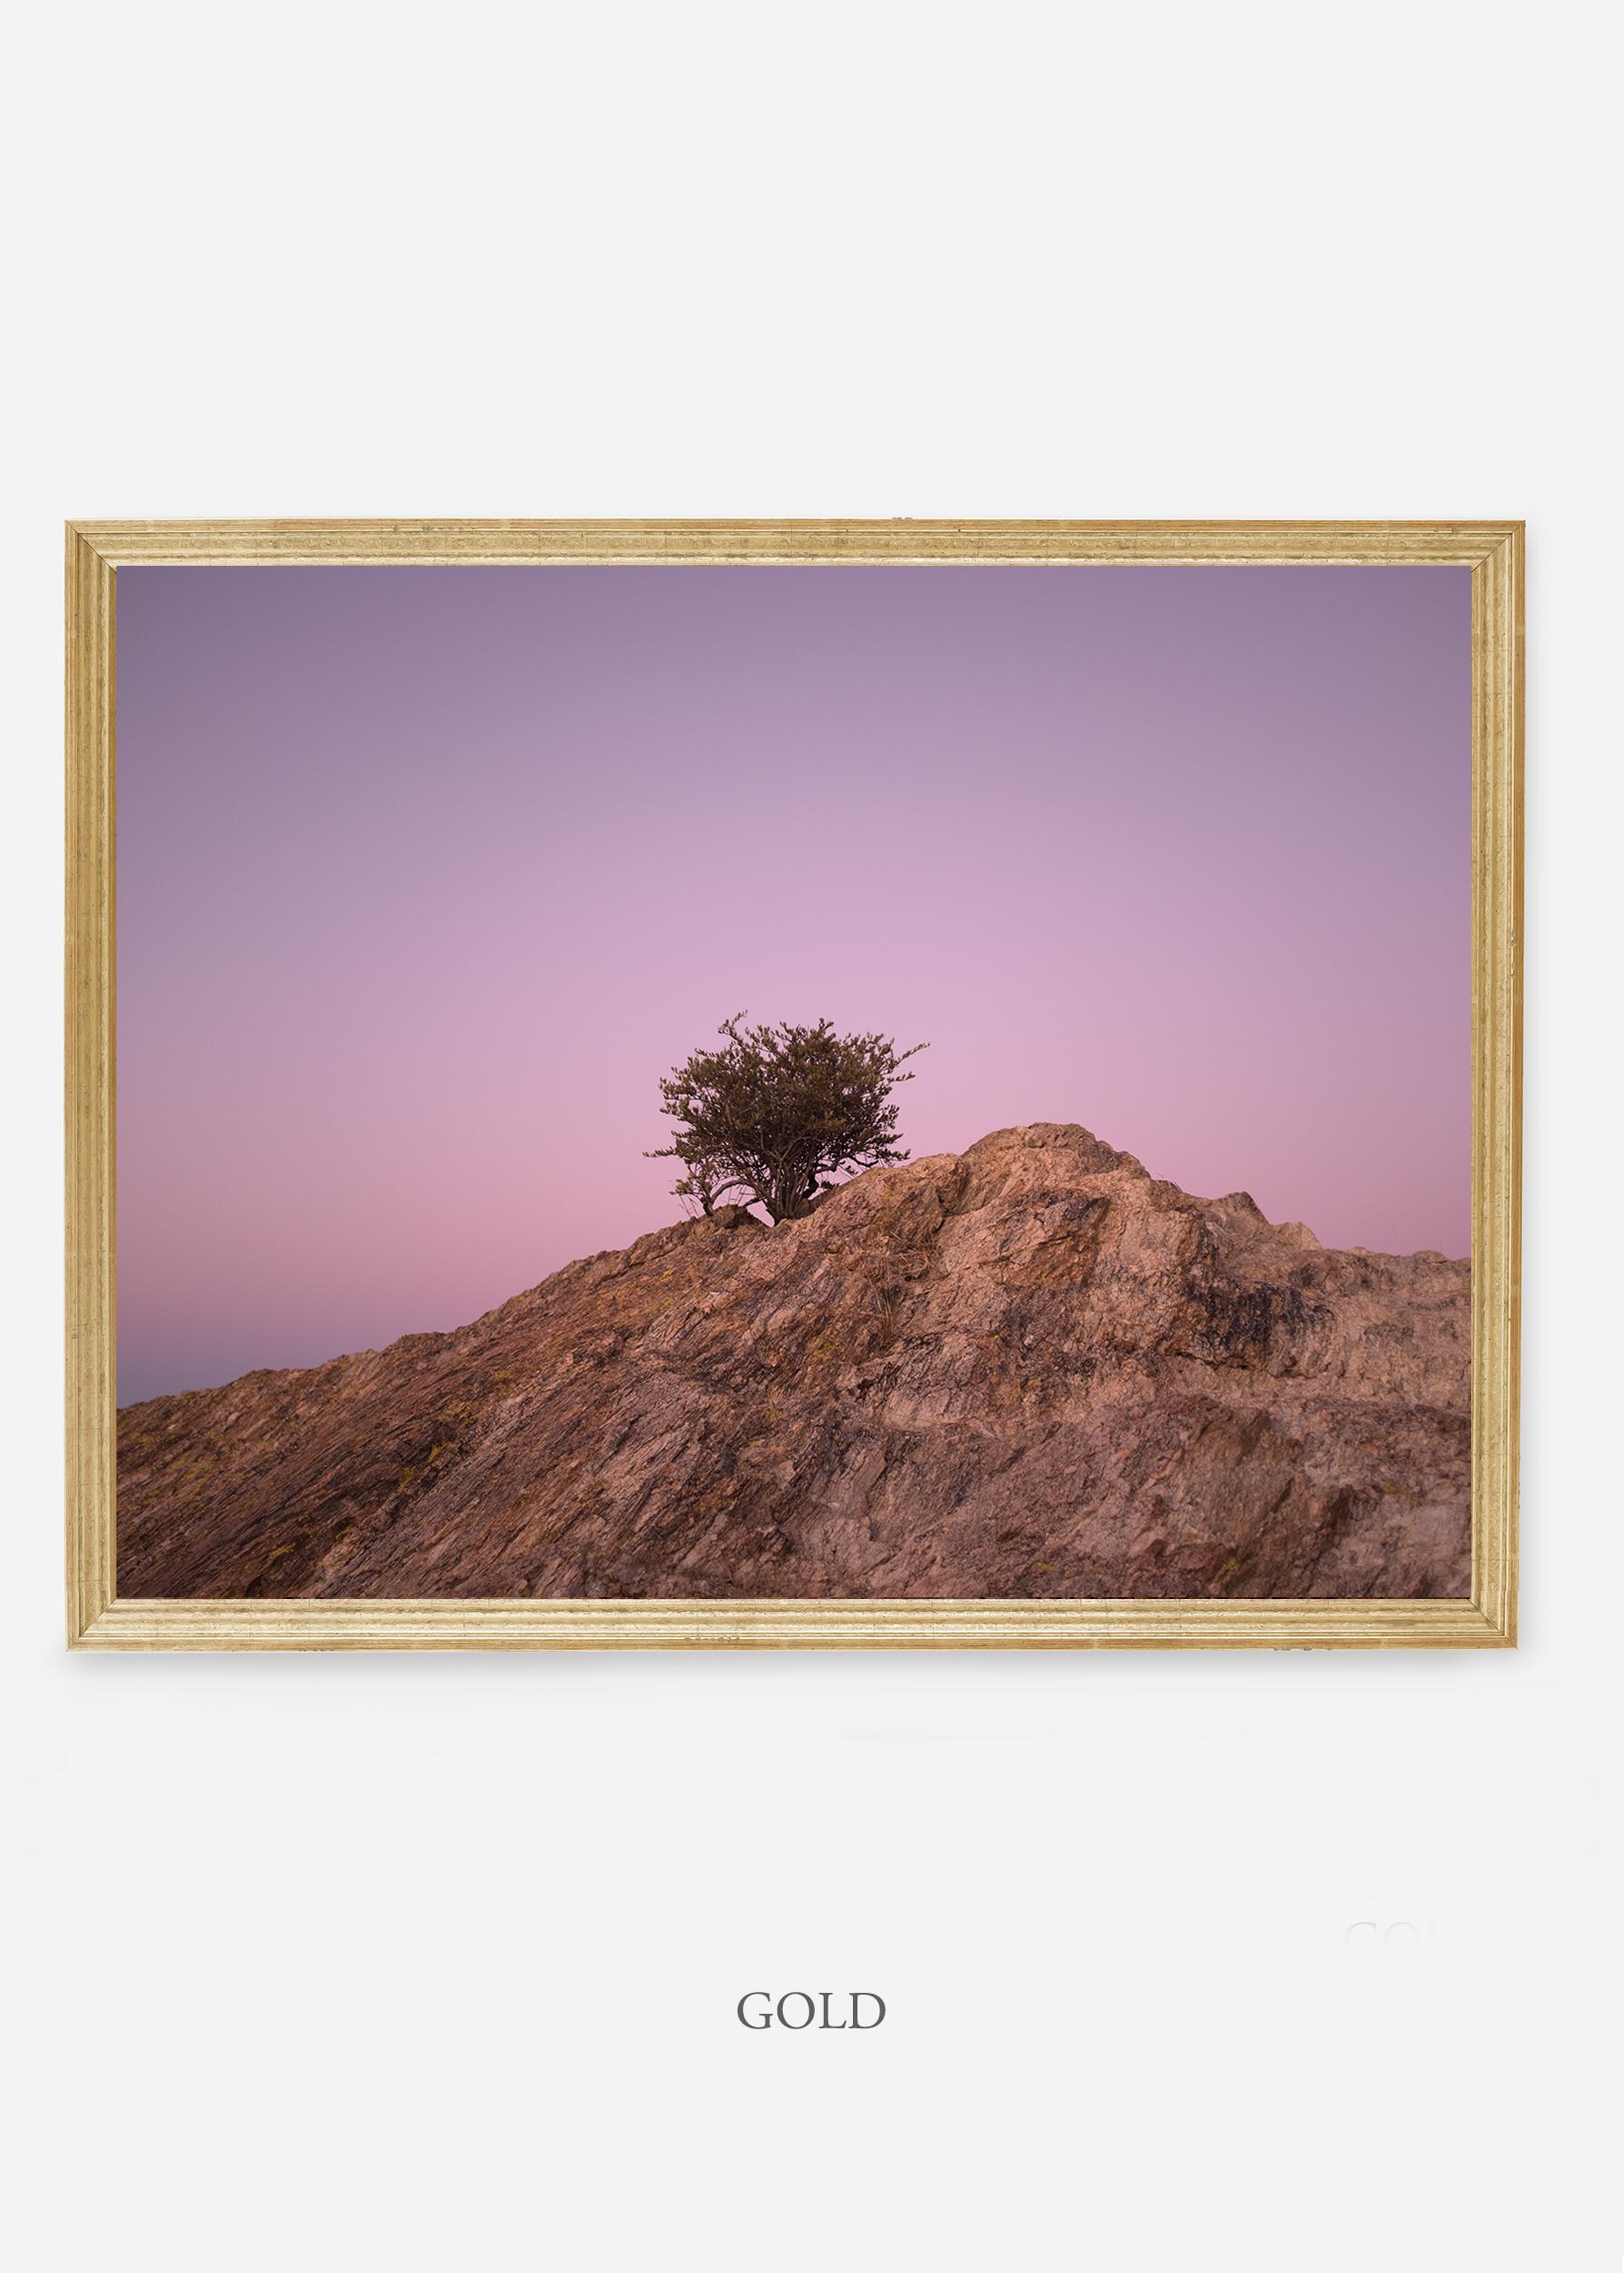 nomat-goldframe-saguaroNo.11-wildercalifornia-art-wallart-cactusprint-homedecor-prints-arizona-botanical-artwork-interiordesign.jpg